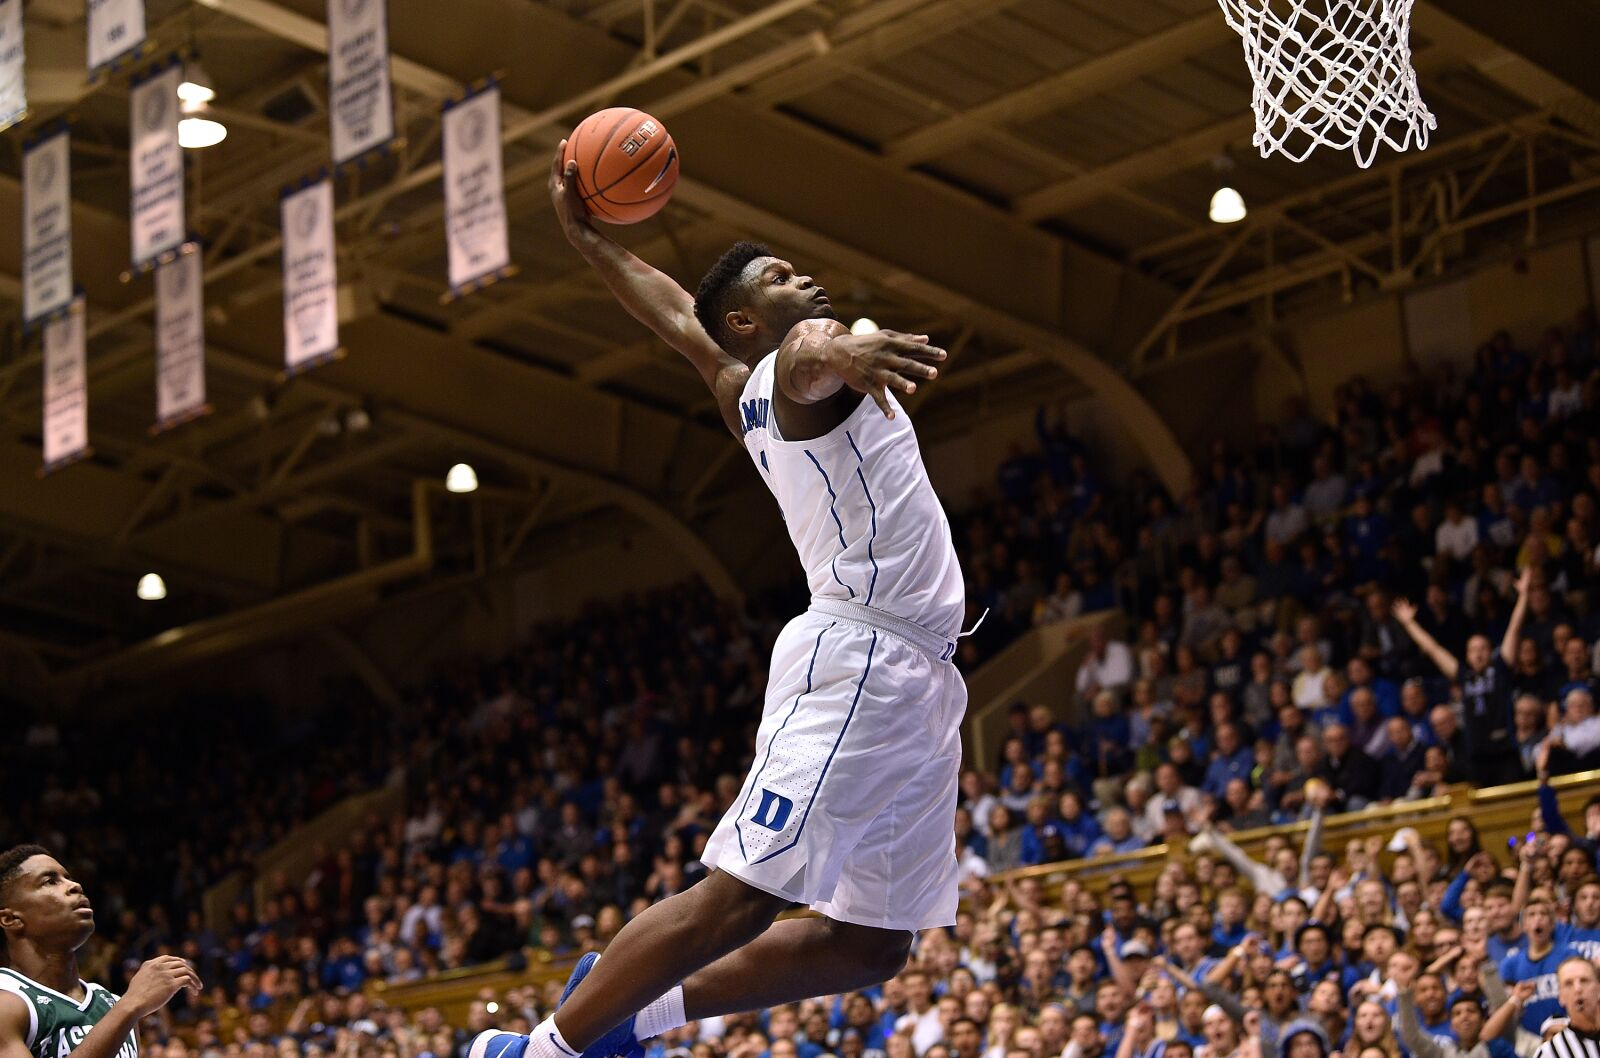 Duke Basketball: Blue Devils stomp EMU, look ready for Hawaii